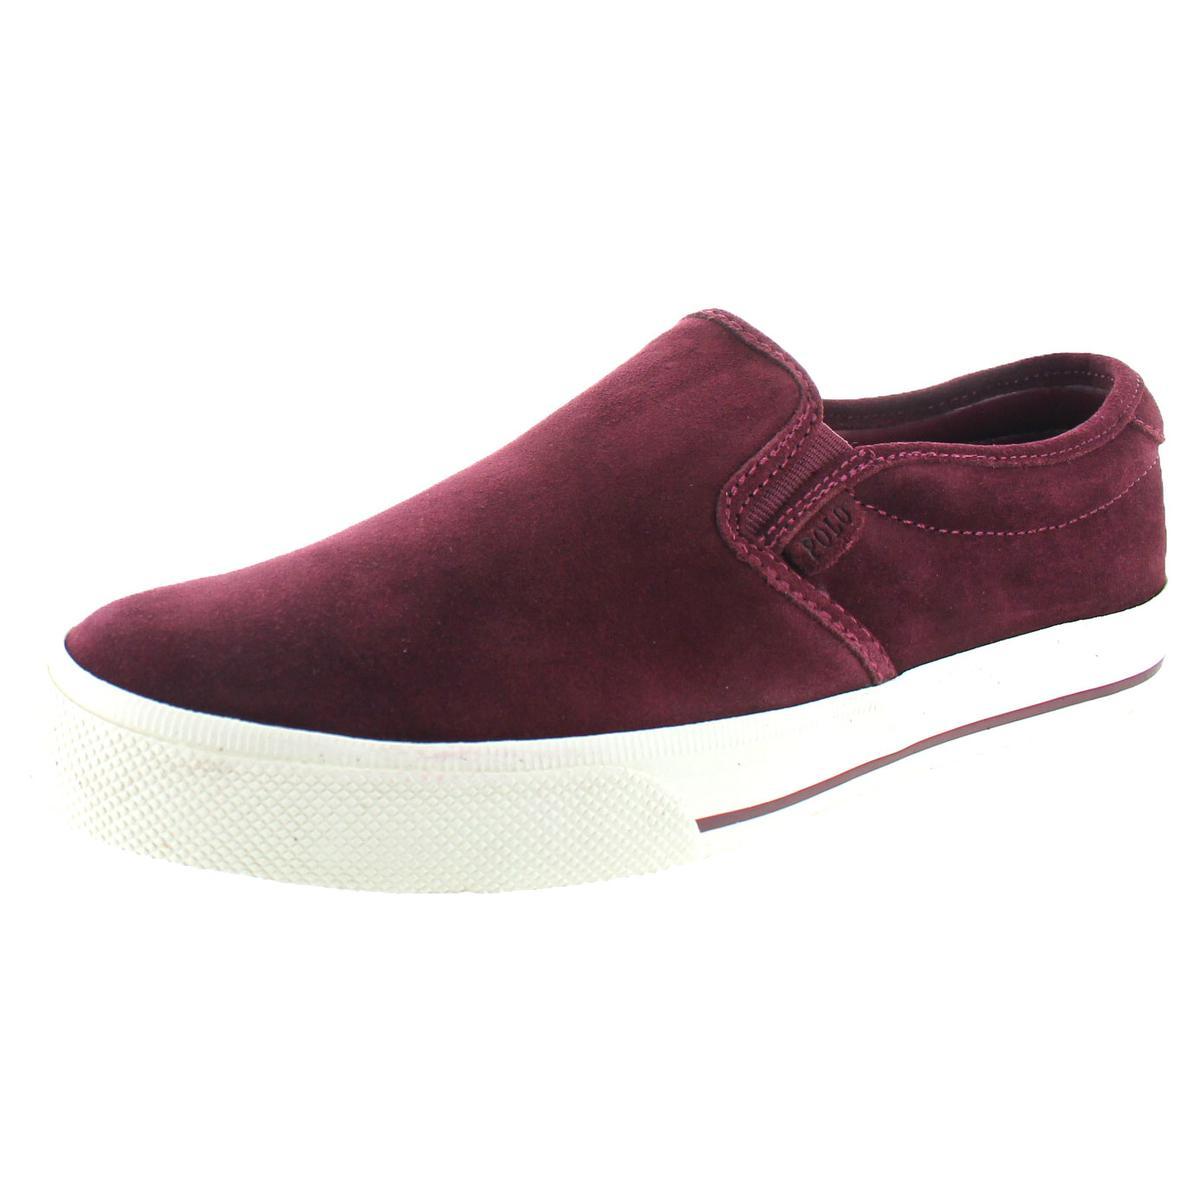 0c7d8533859b26 Details about Polo Ralph Lauren Vaughn Men s Suede Slip On Sneakers Shoes